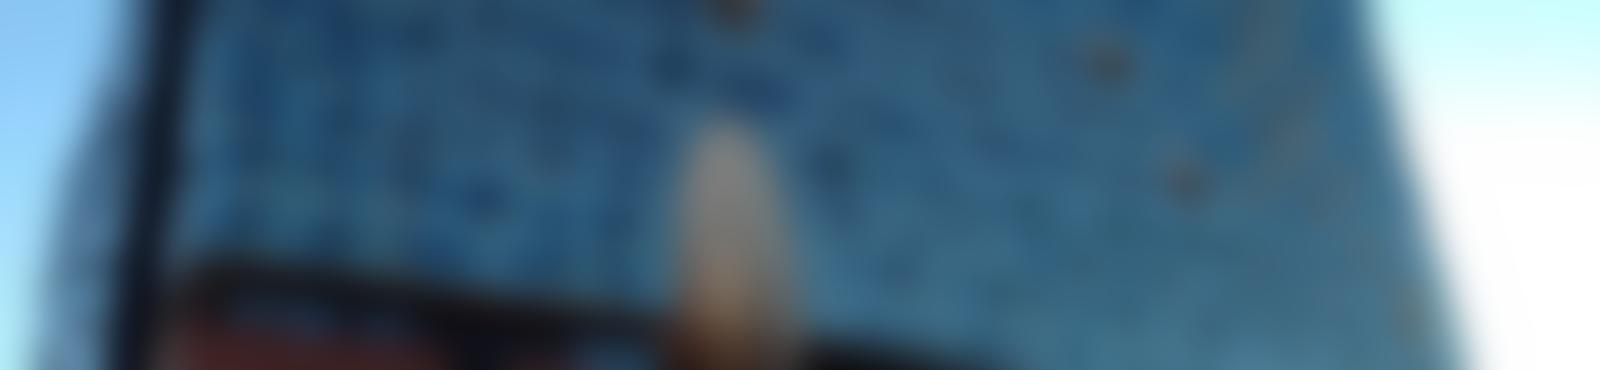 Blurred 449556d4 8dce 4061 b7bf 8da8990fc1dd